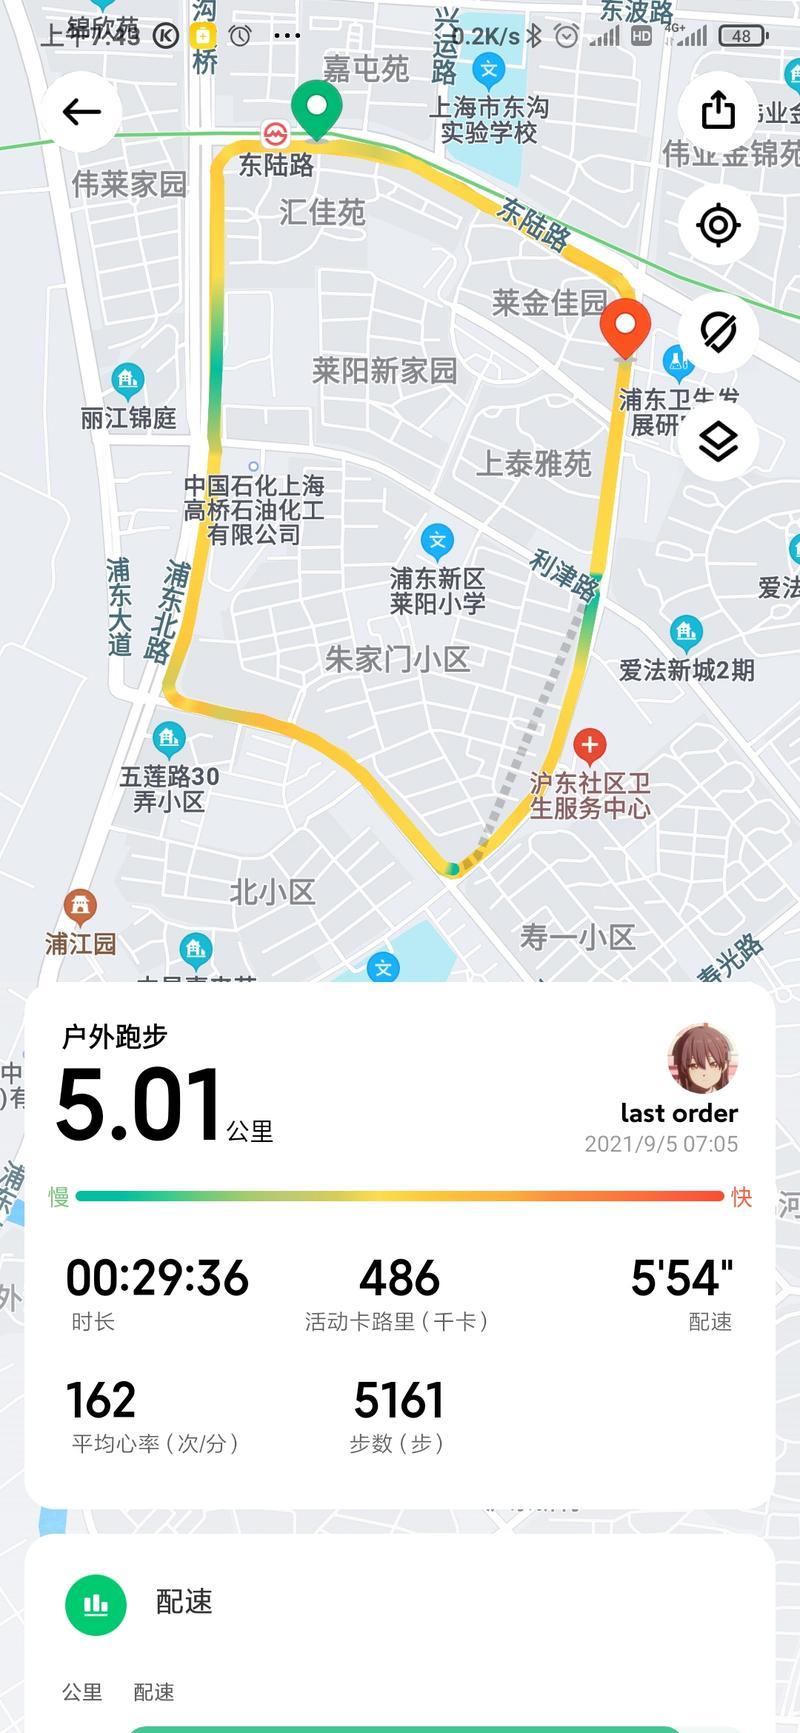 last_order于2021-09-05 07:45发布的图片